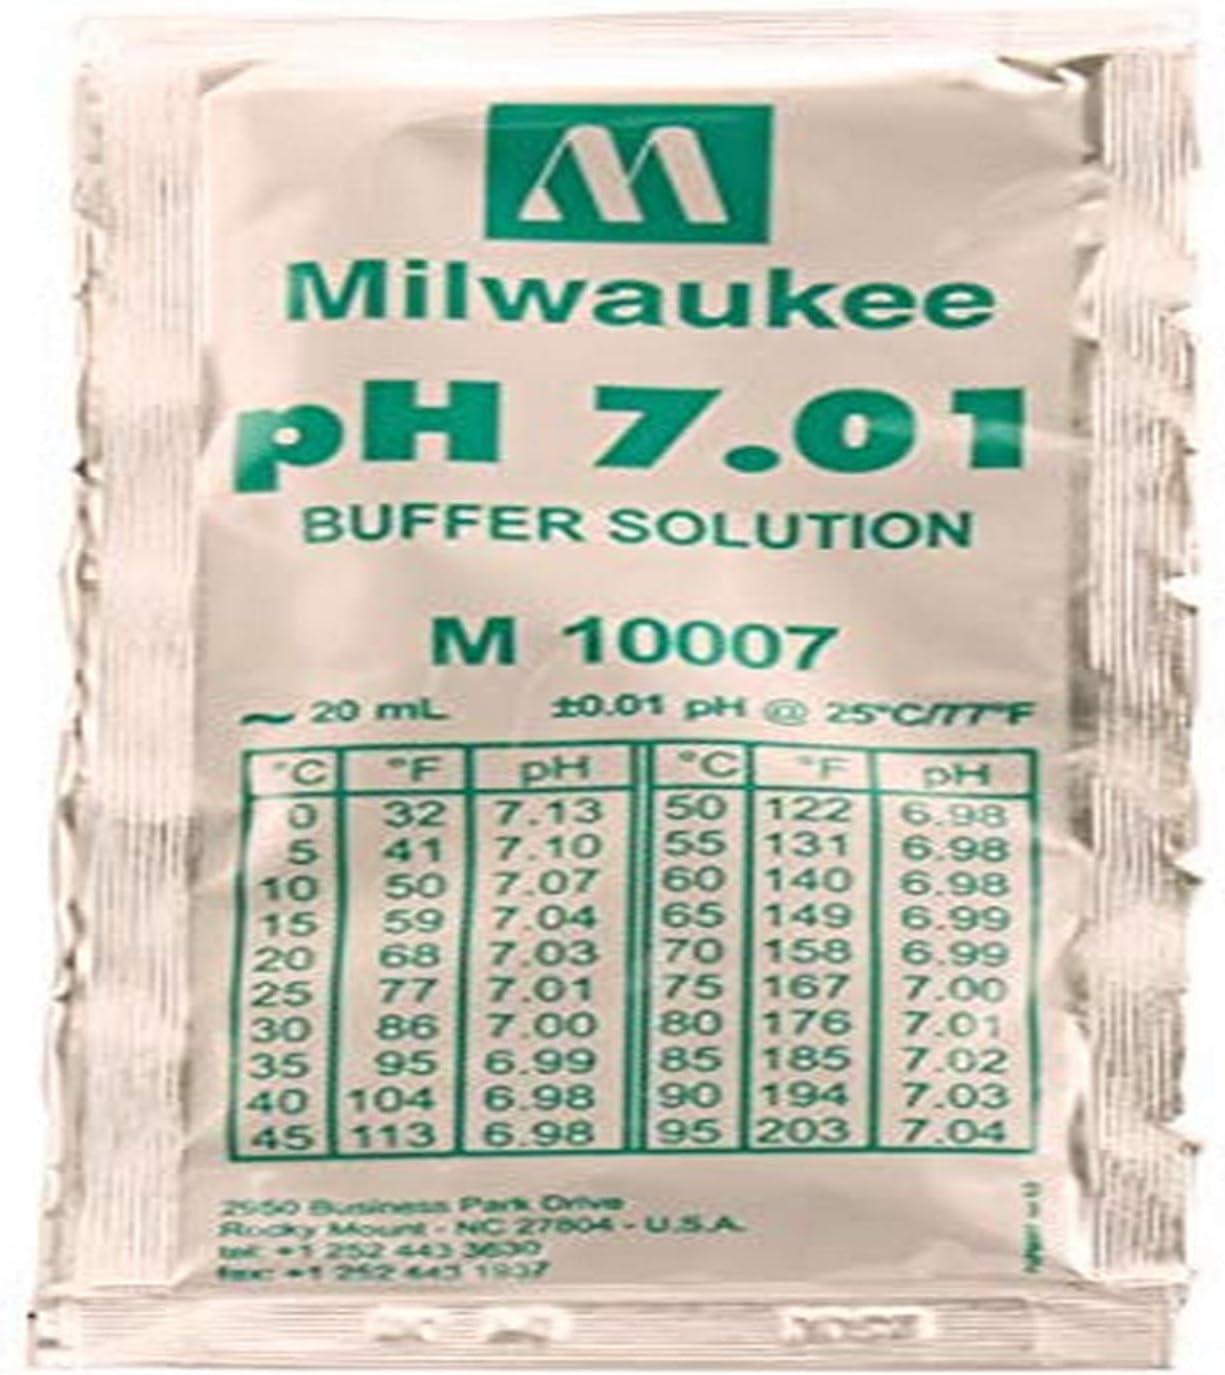 MILWAUKEE'S M10007B - 20 ml Packet 25 Buffer Cs Solution latest Seasonal Wrap Introduction 7.01